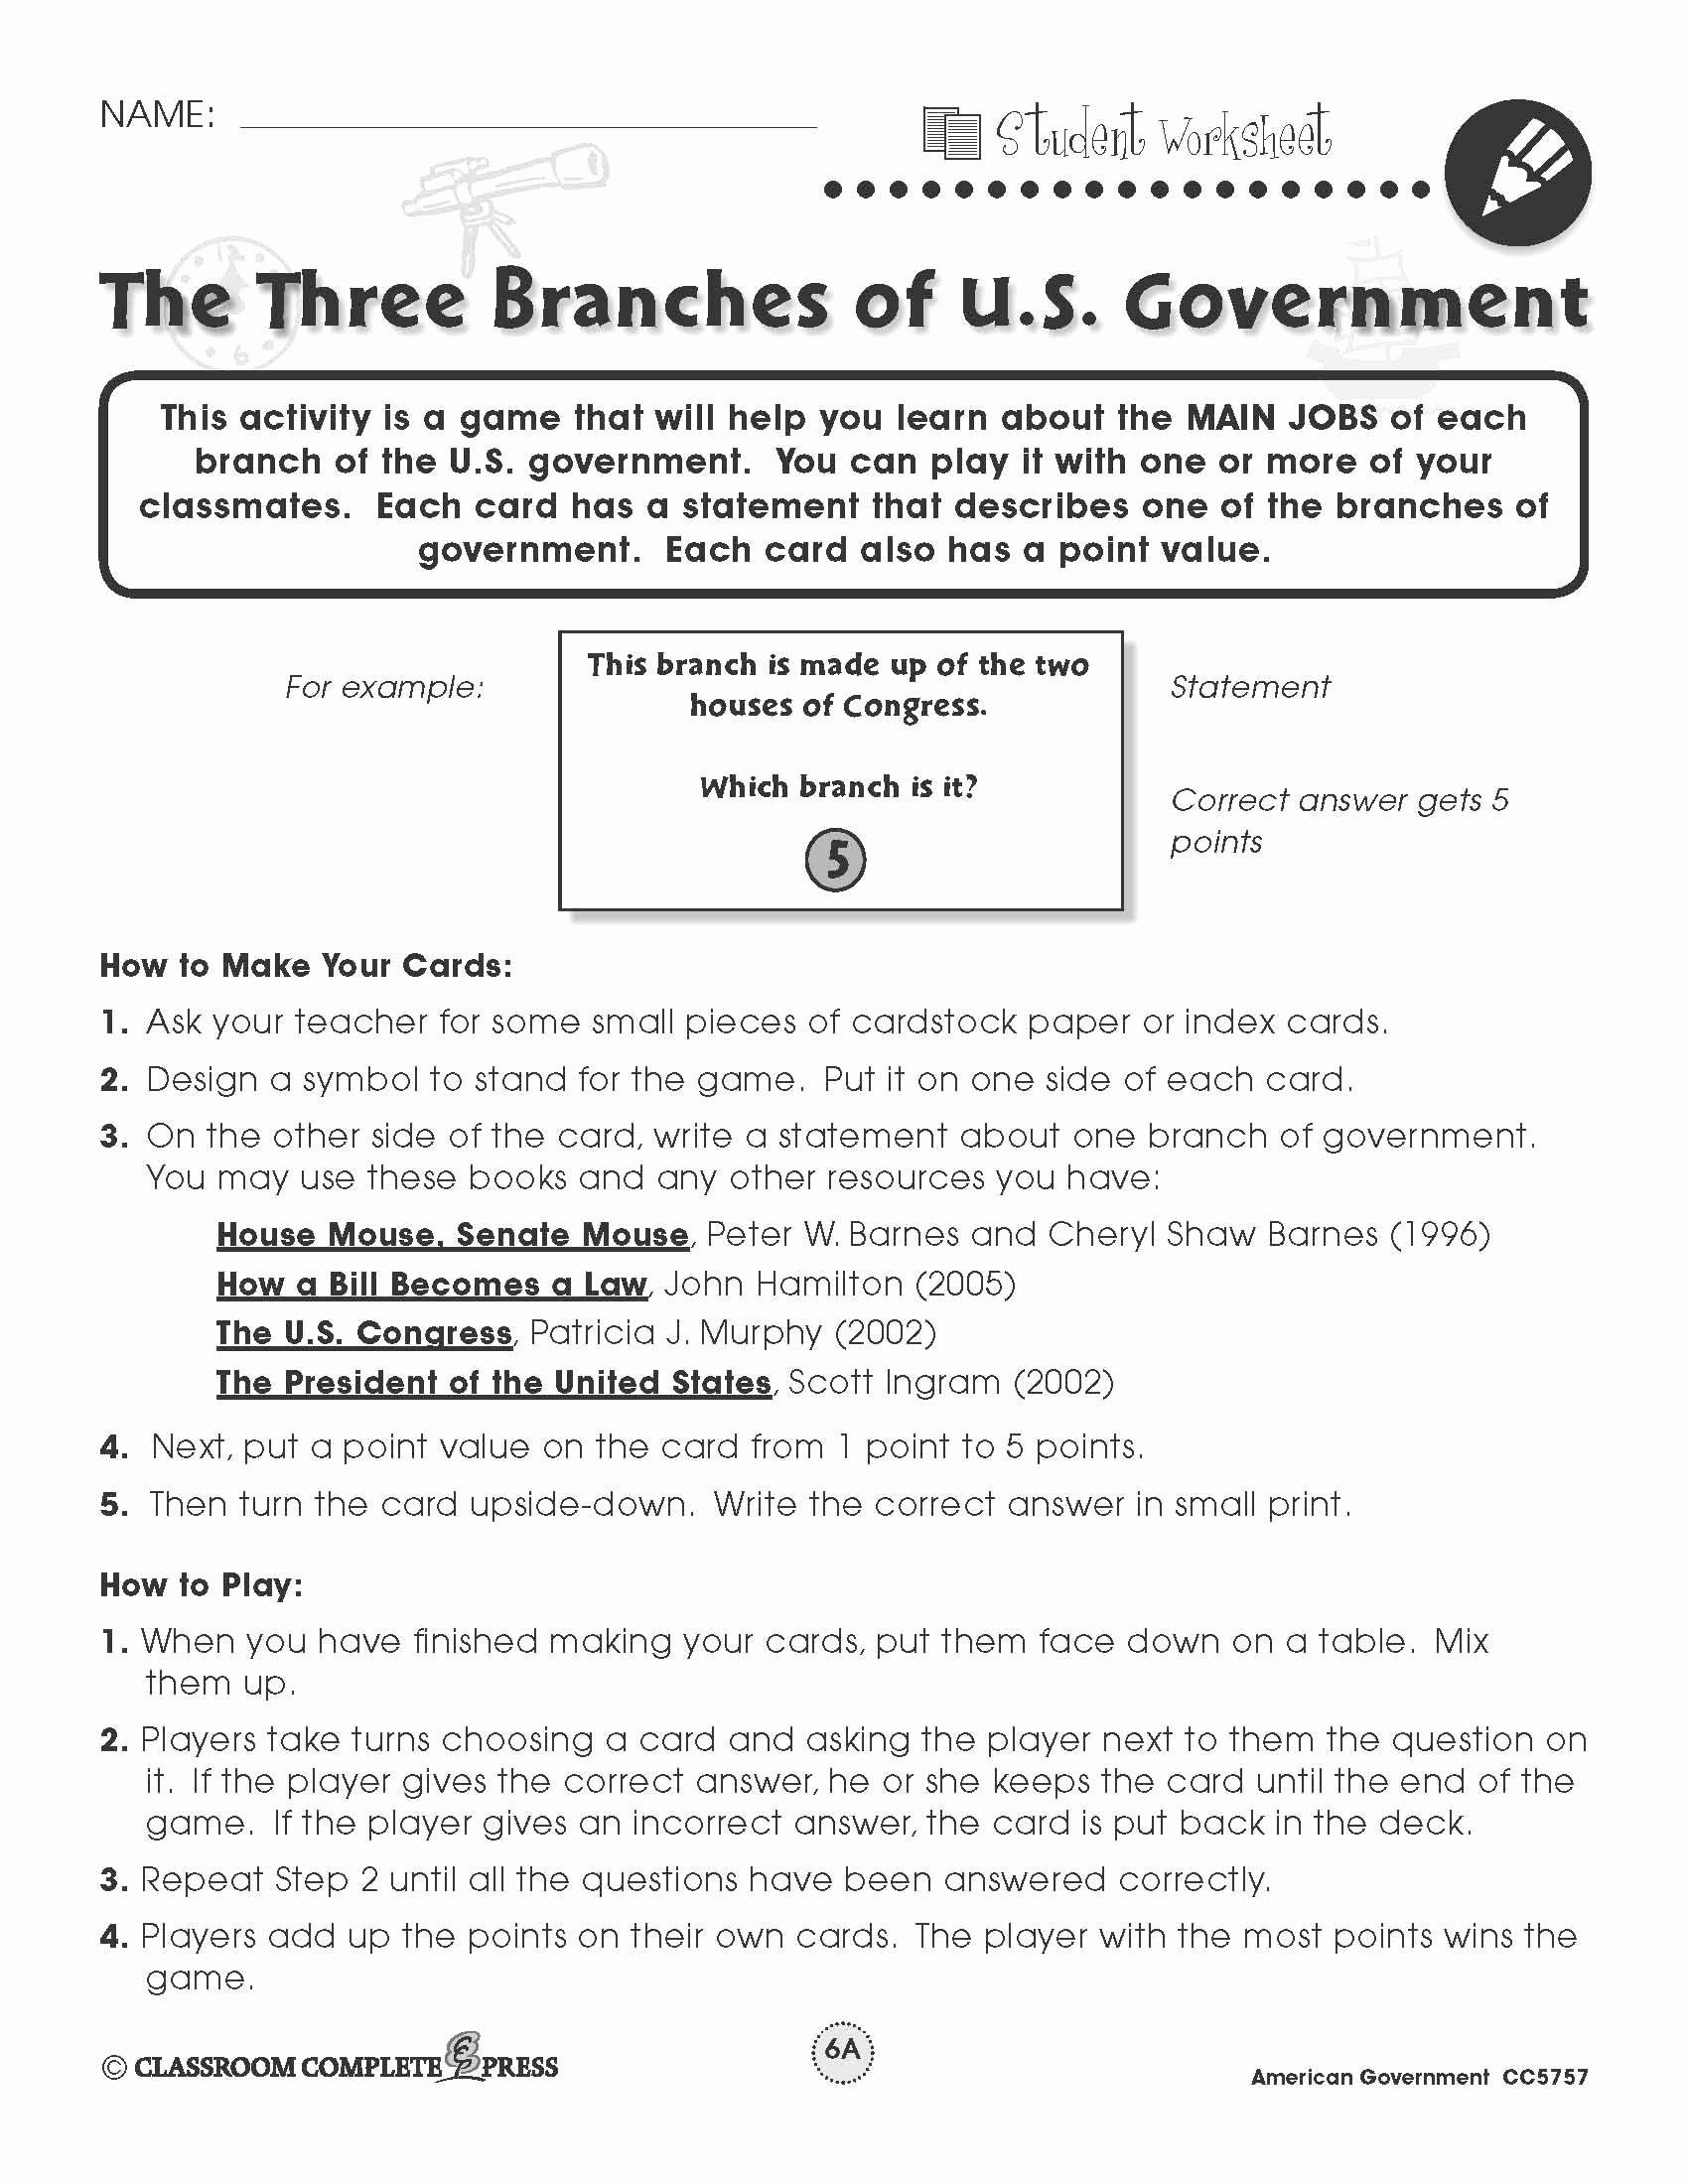 Limiting Ernment Icivics Worksheet Answer Key